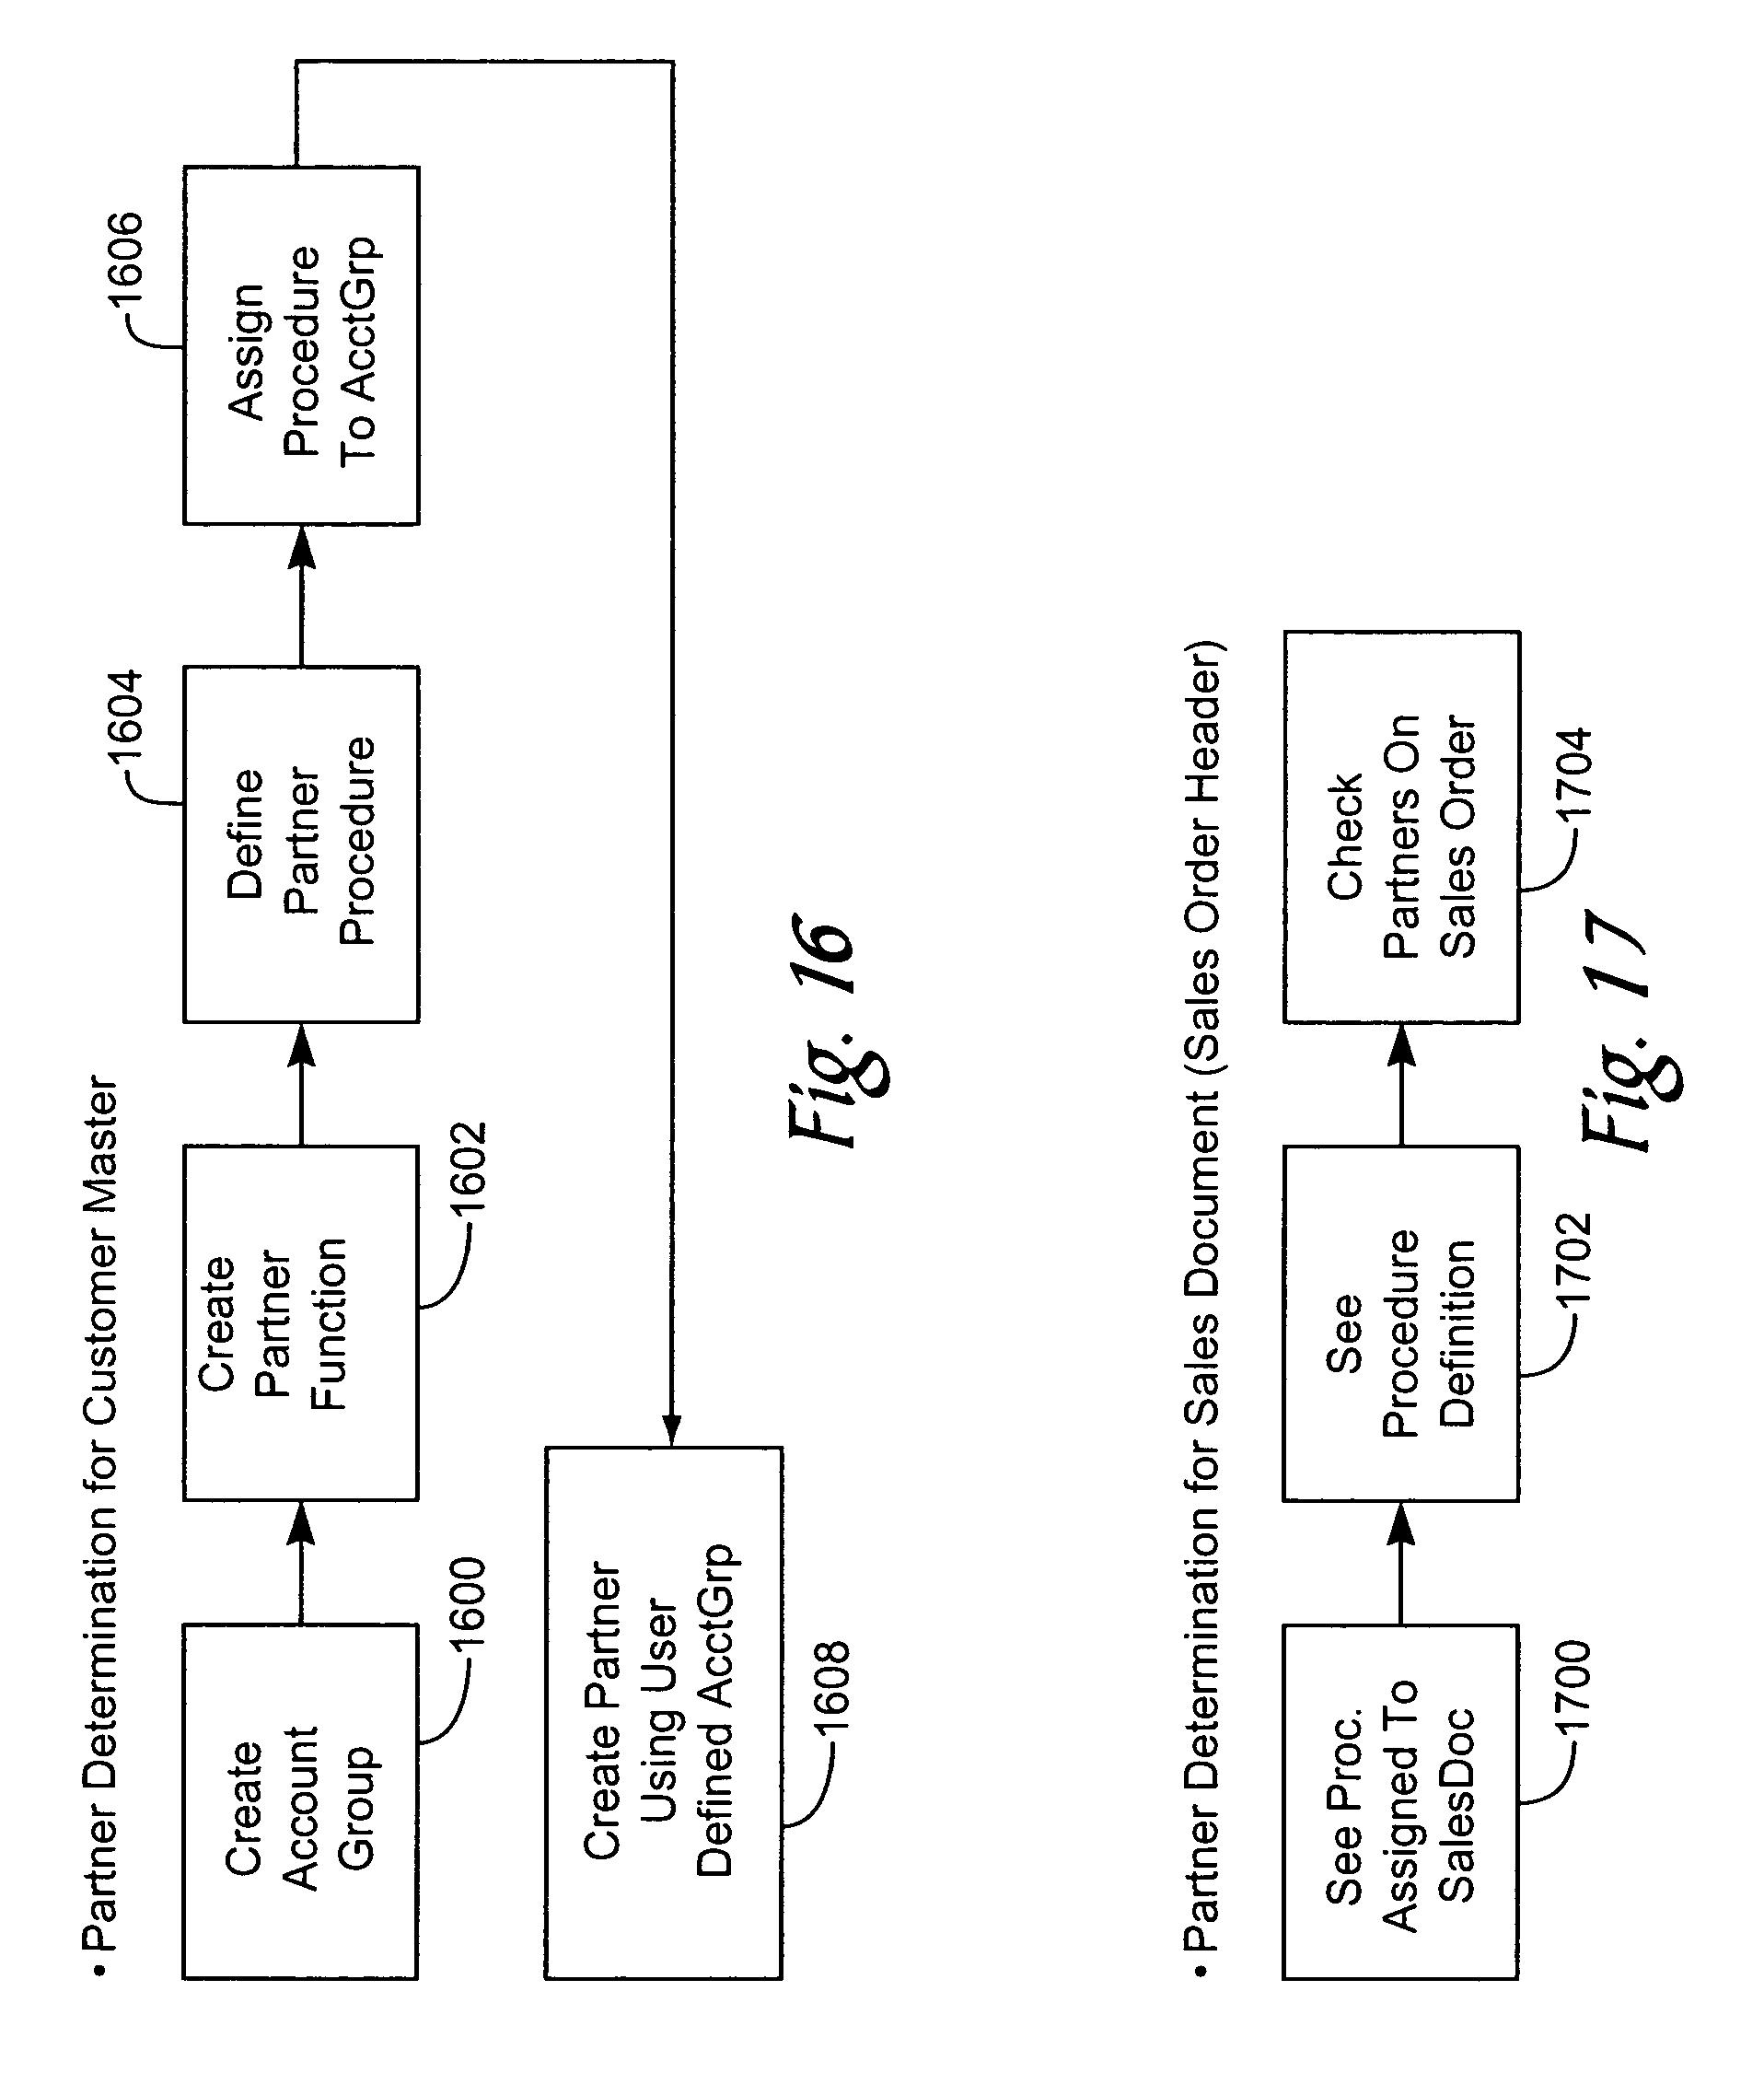 Patent US 8,117,093 B2